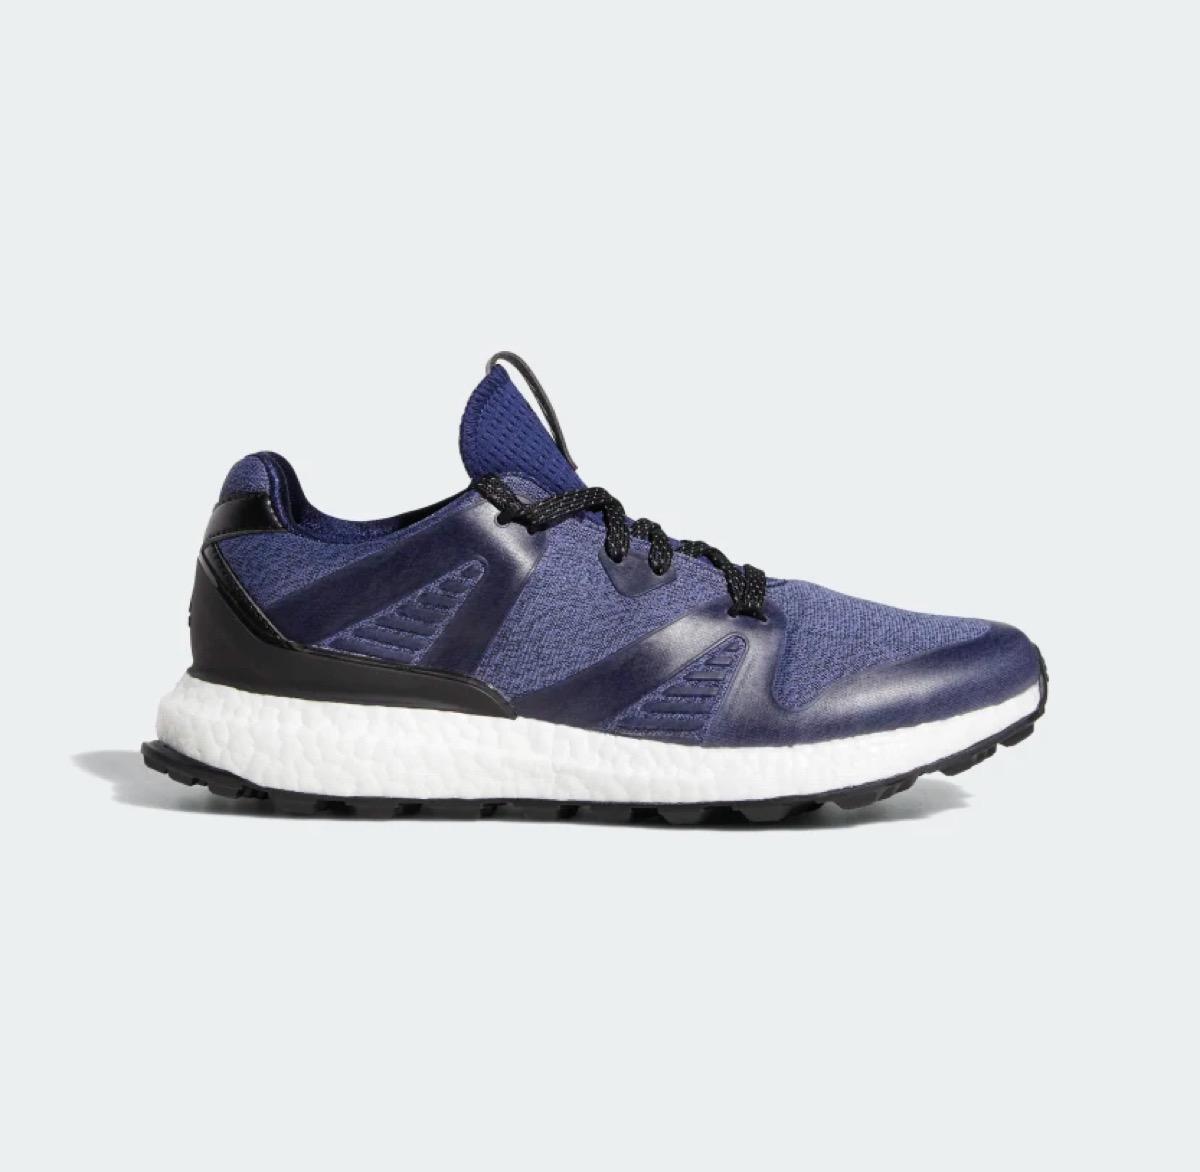 Adidas Crossknit Golf Shoes